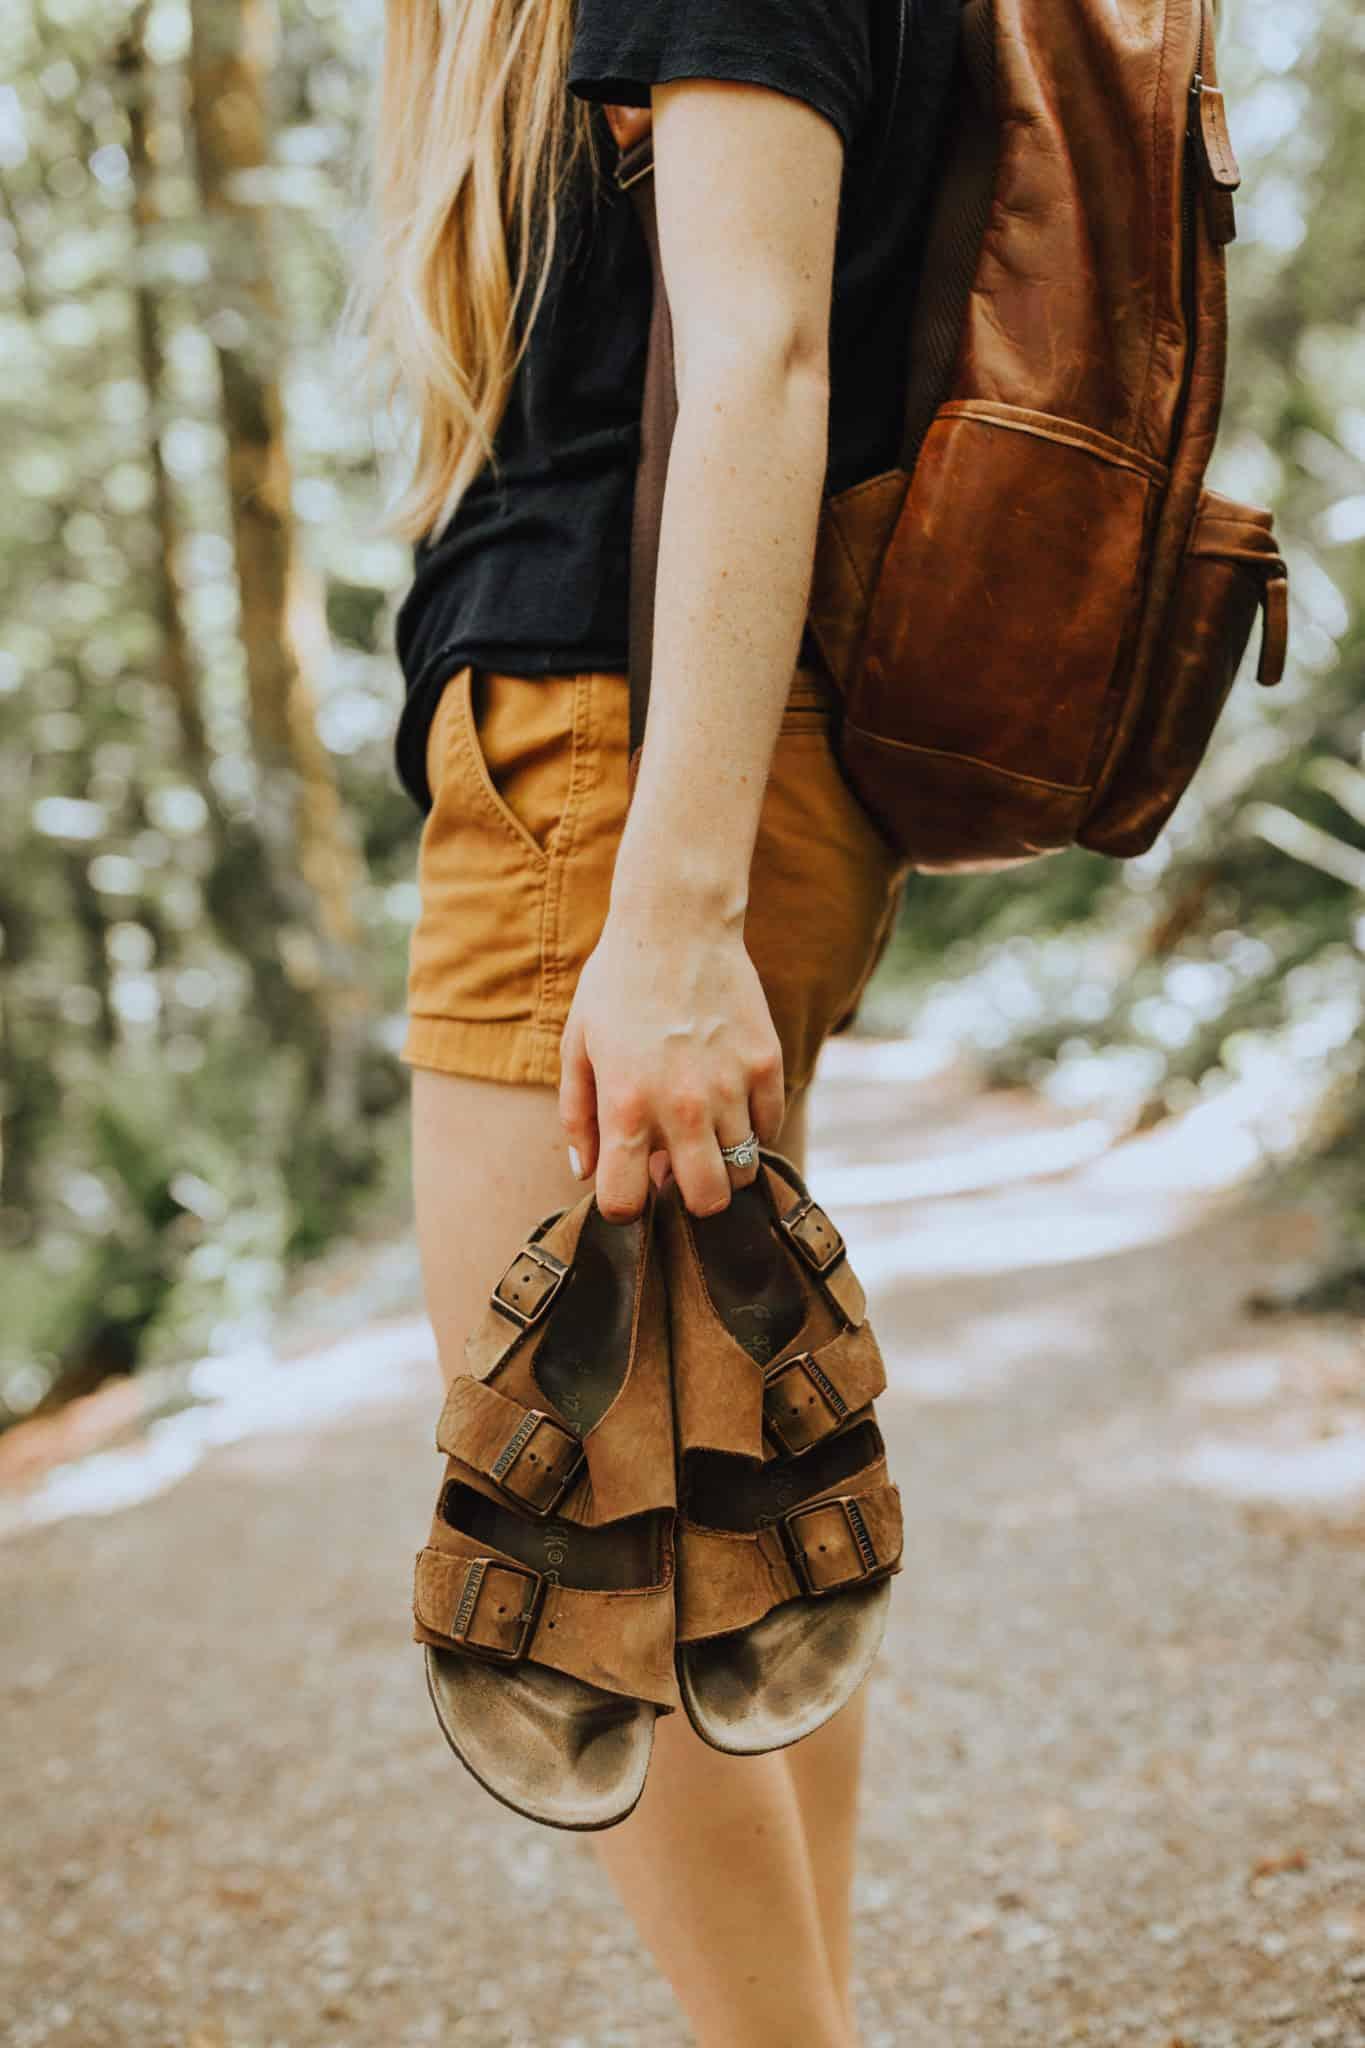 Birkenstocks - Hiking In The Pacific Northwest - TheMandagies.com